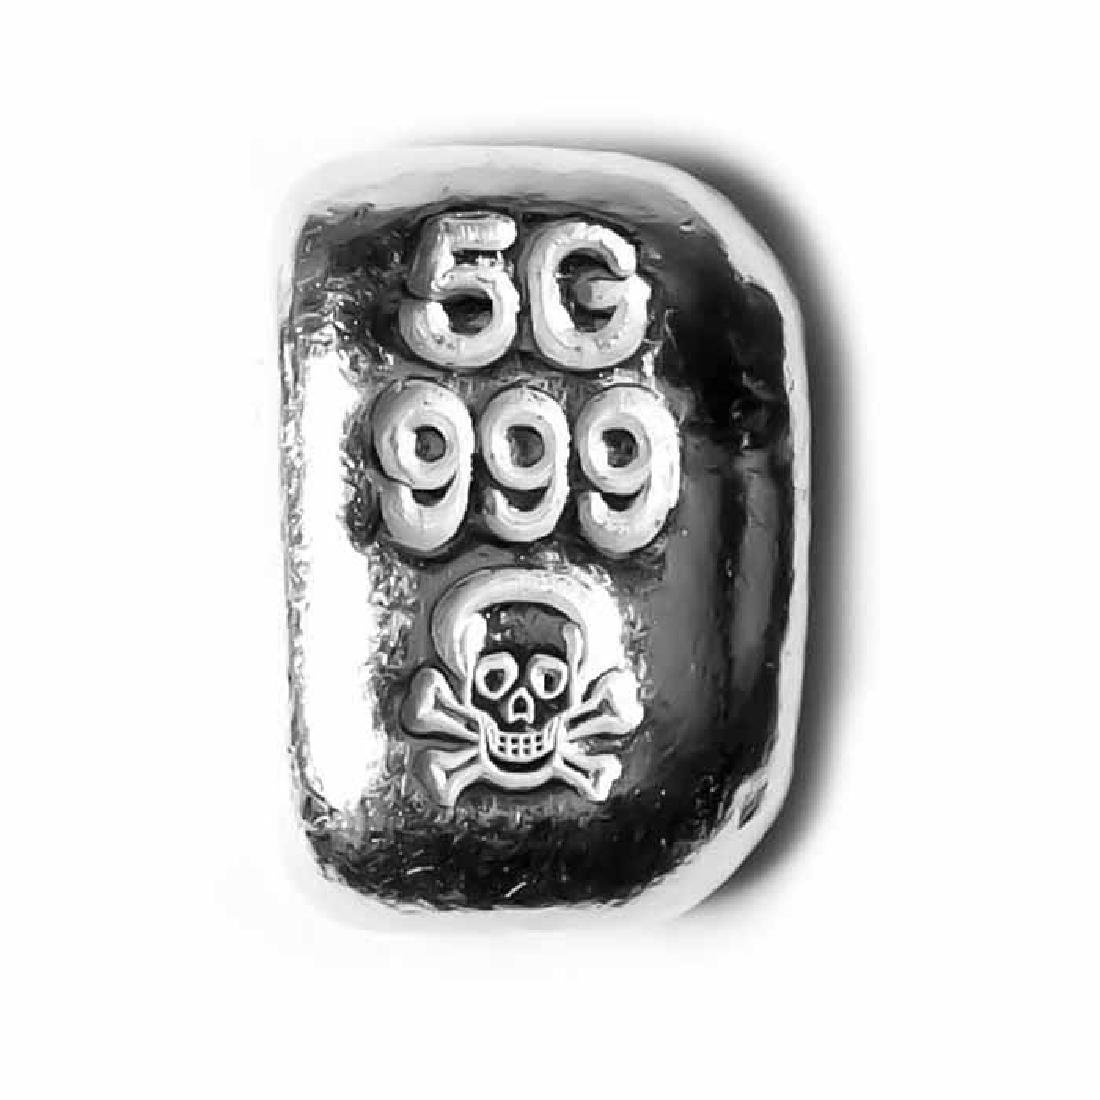 5 Gram Atlantis Skull and Crossbones Hand Poured Silver